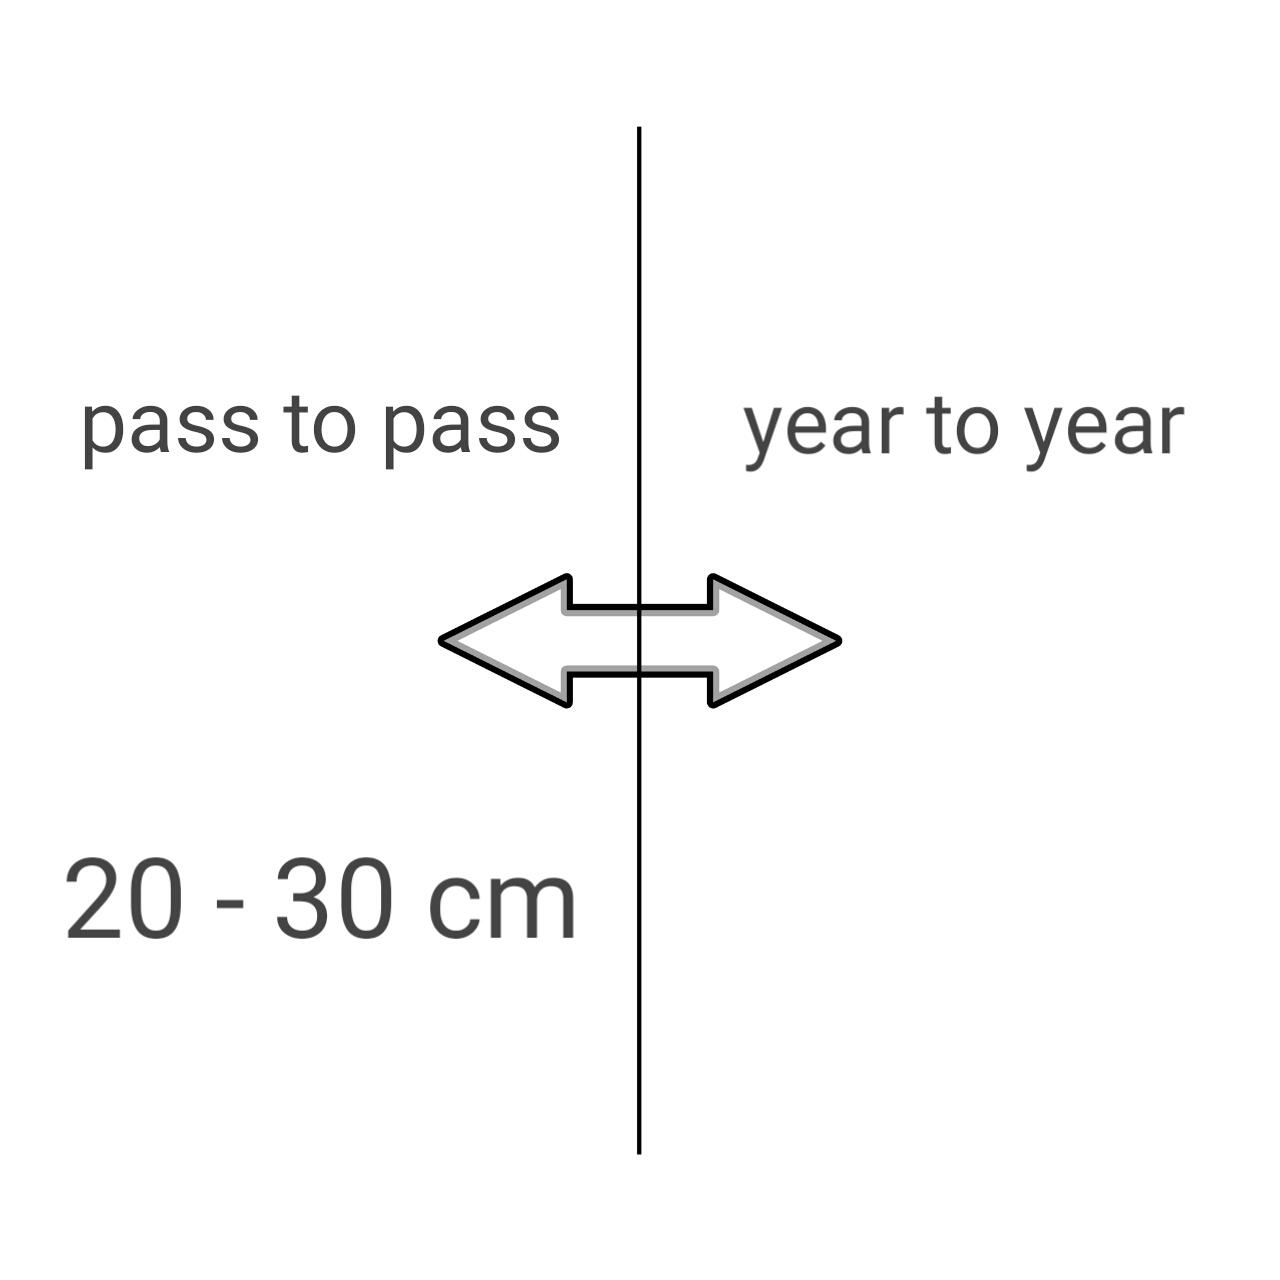 WAAS, EGNOS 20 – 30 cm Korrektursignal